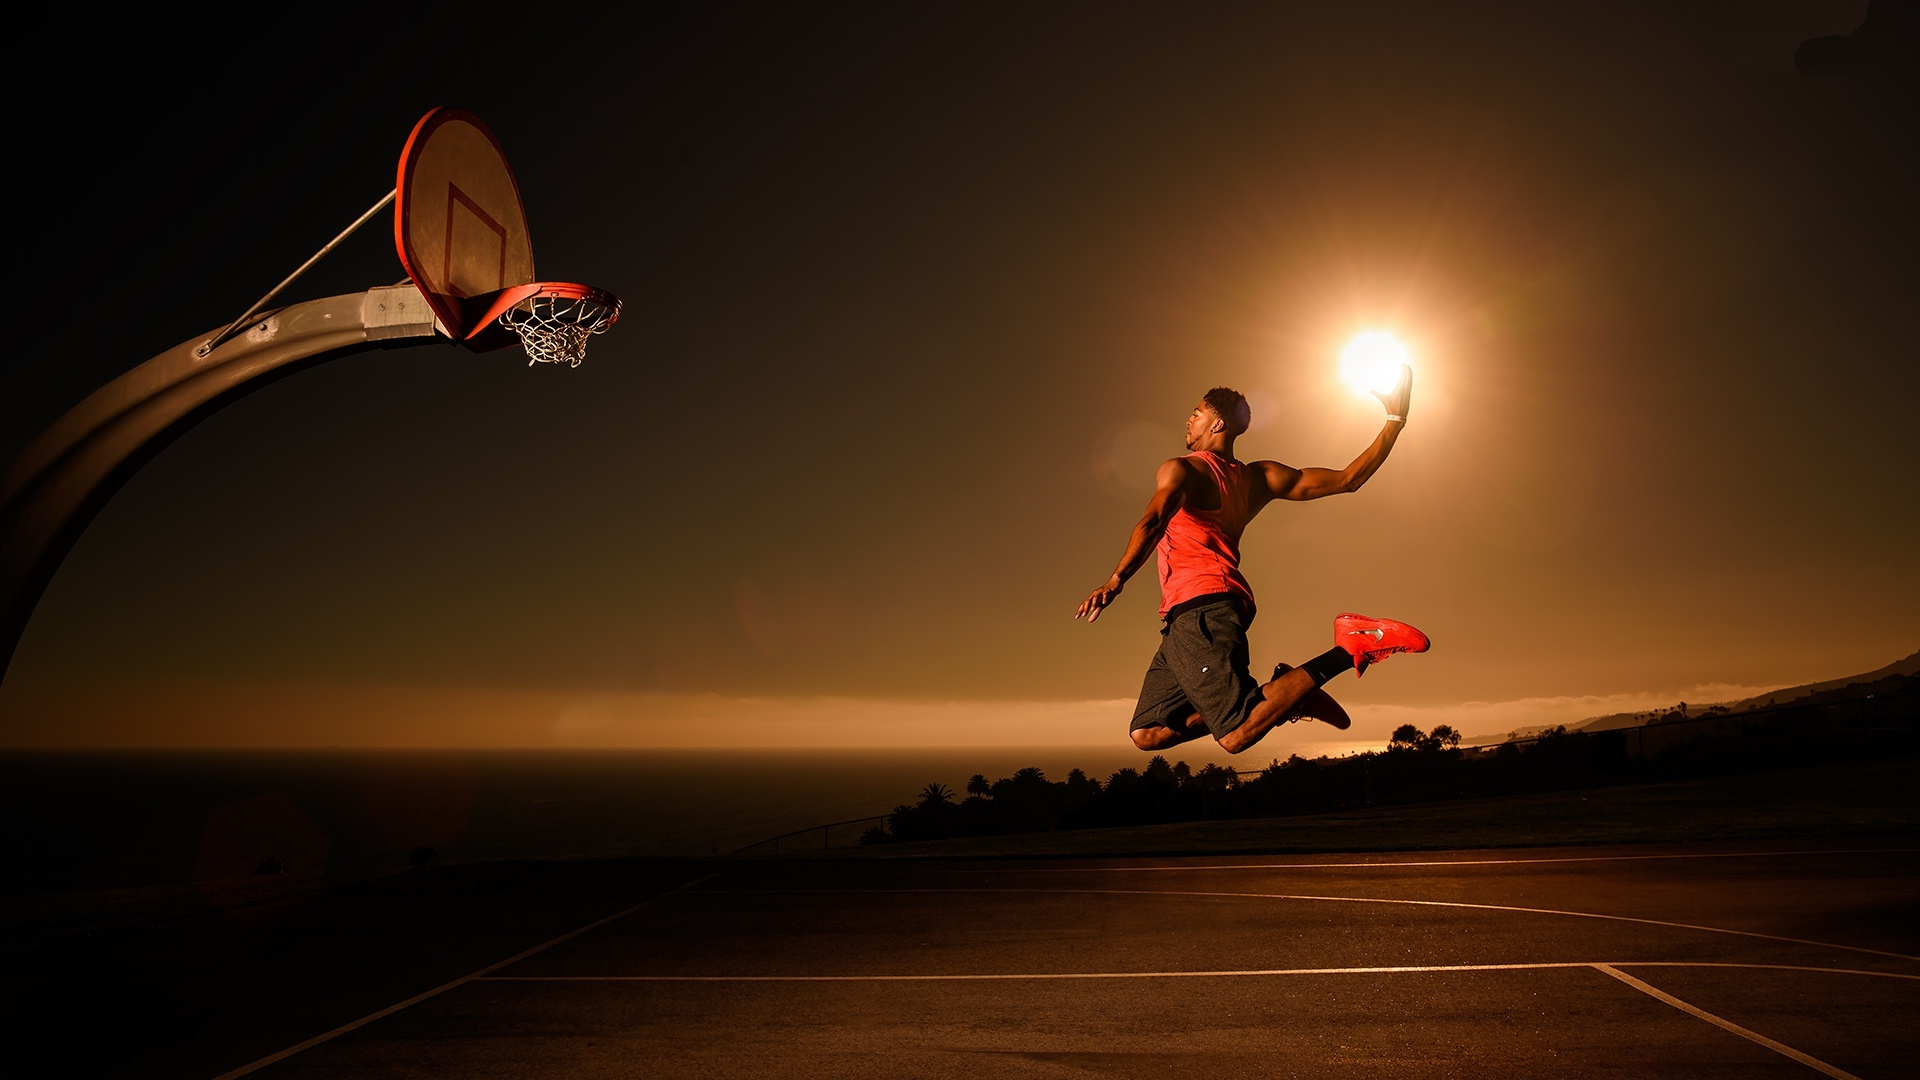 Basketball 1080p wallpaper